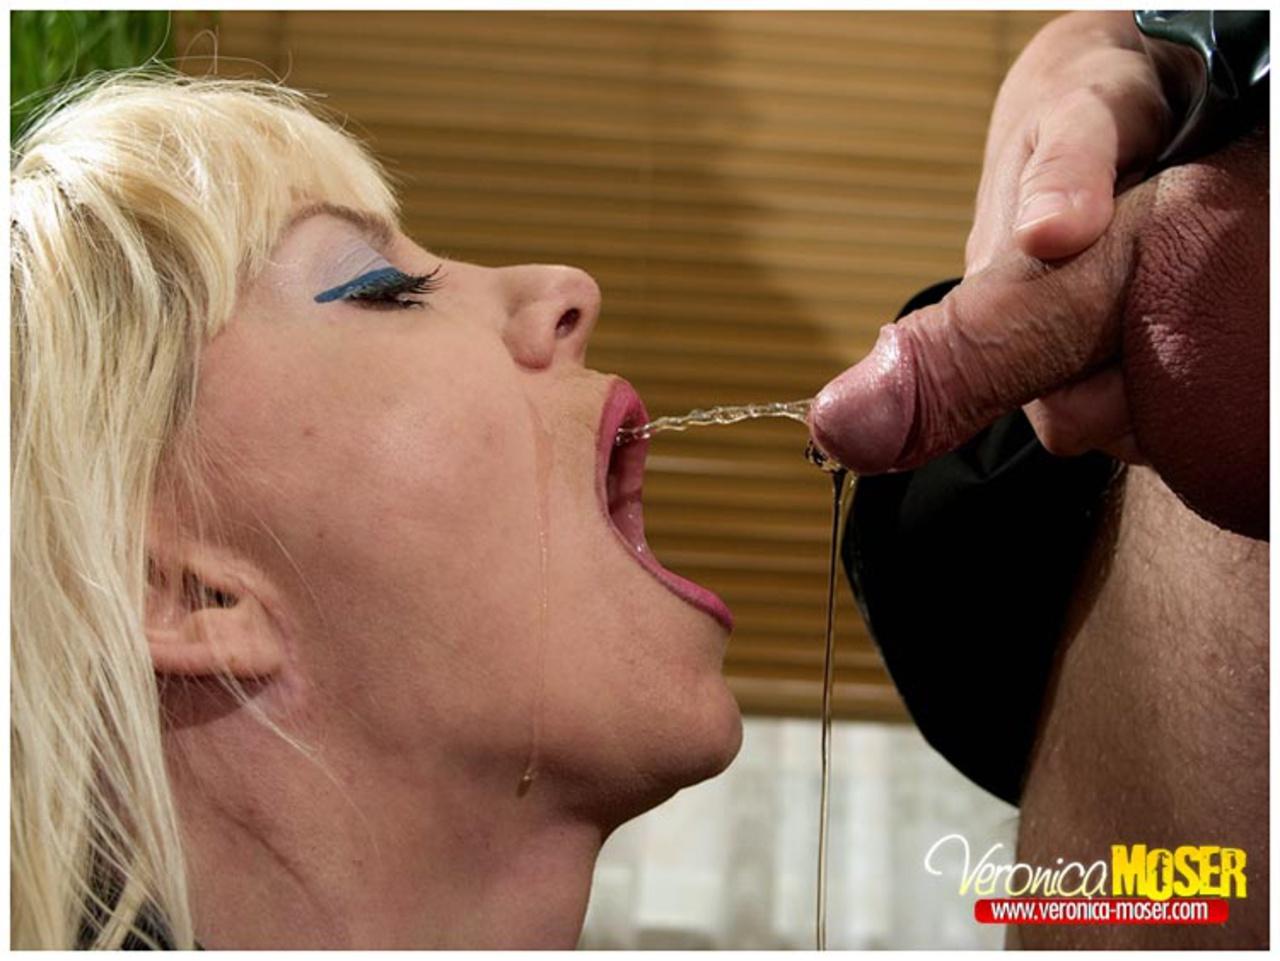 Фото плевки рот, Видеозаписи Spitting или женские плевки ВКонтакте 9 фотография